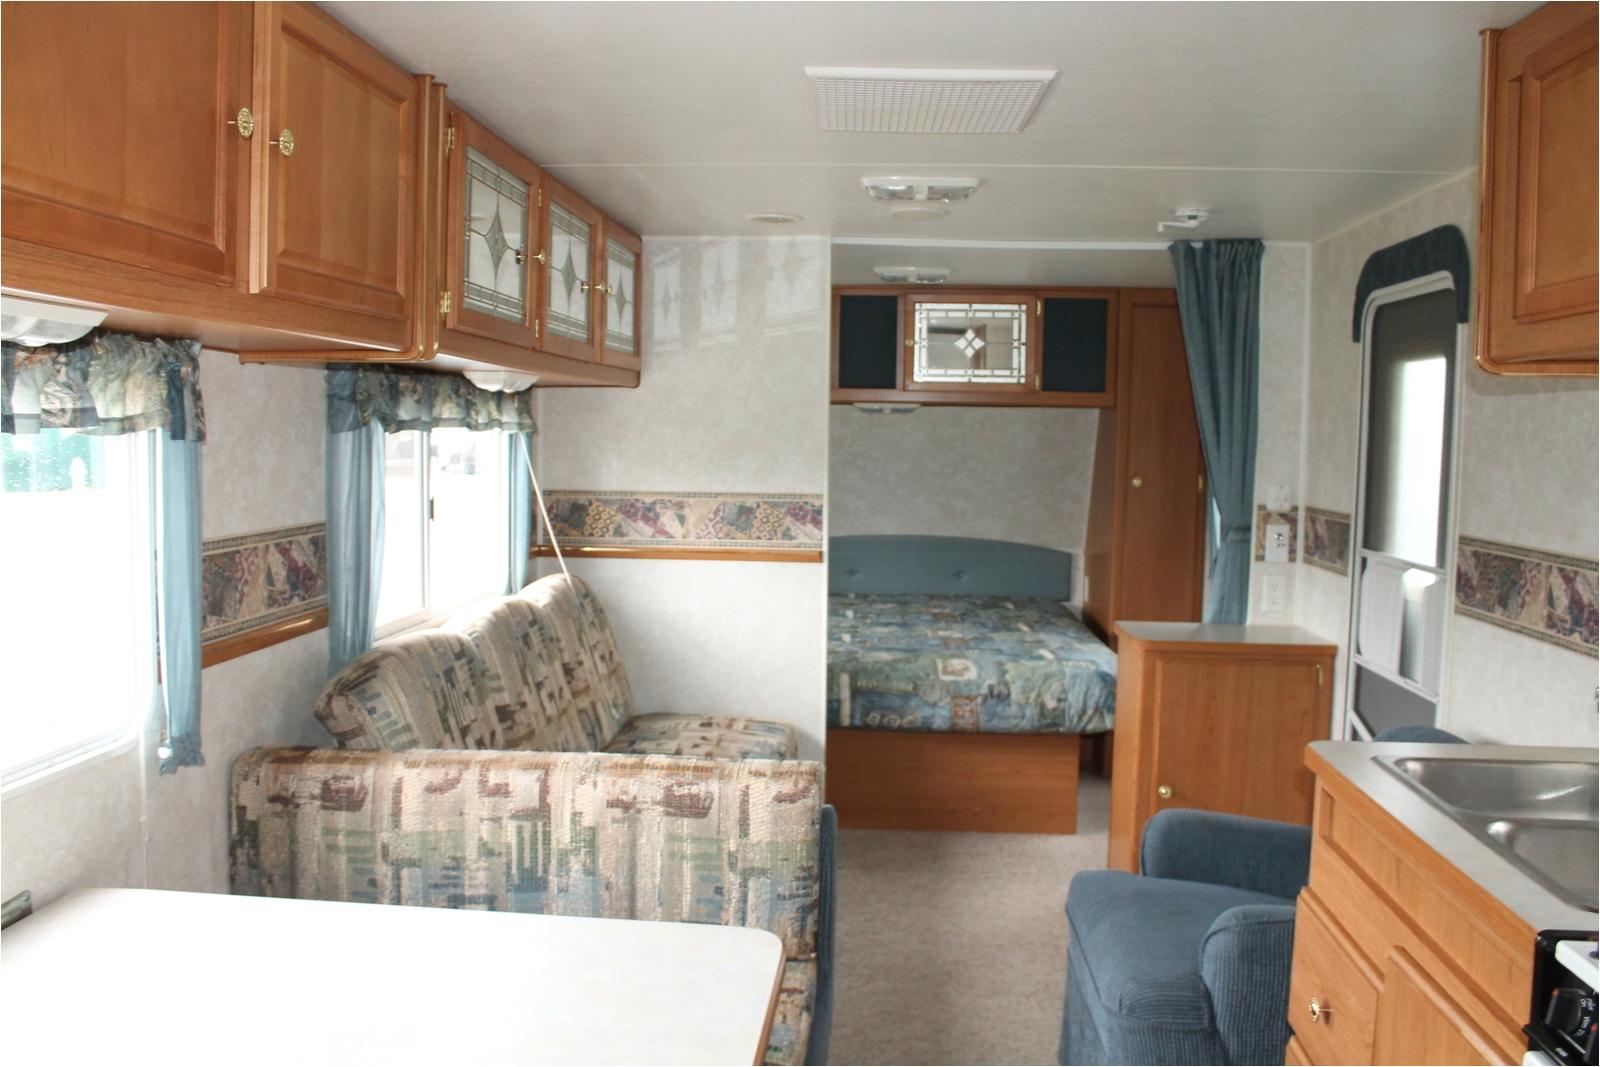 37543 30 2003 fleetwood terry dakota bunk house image